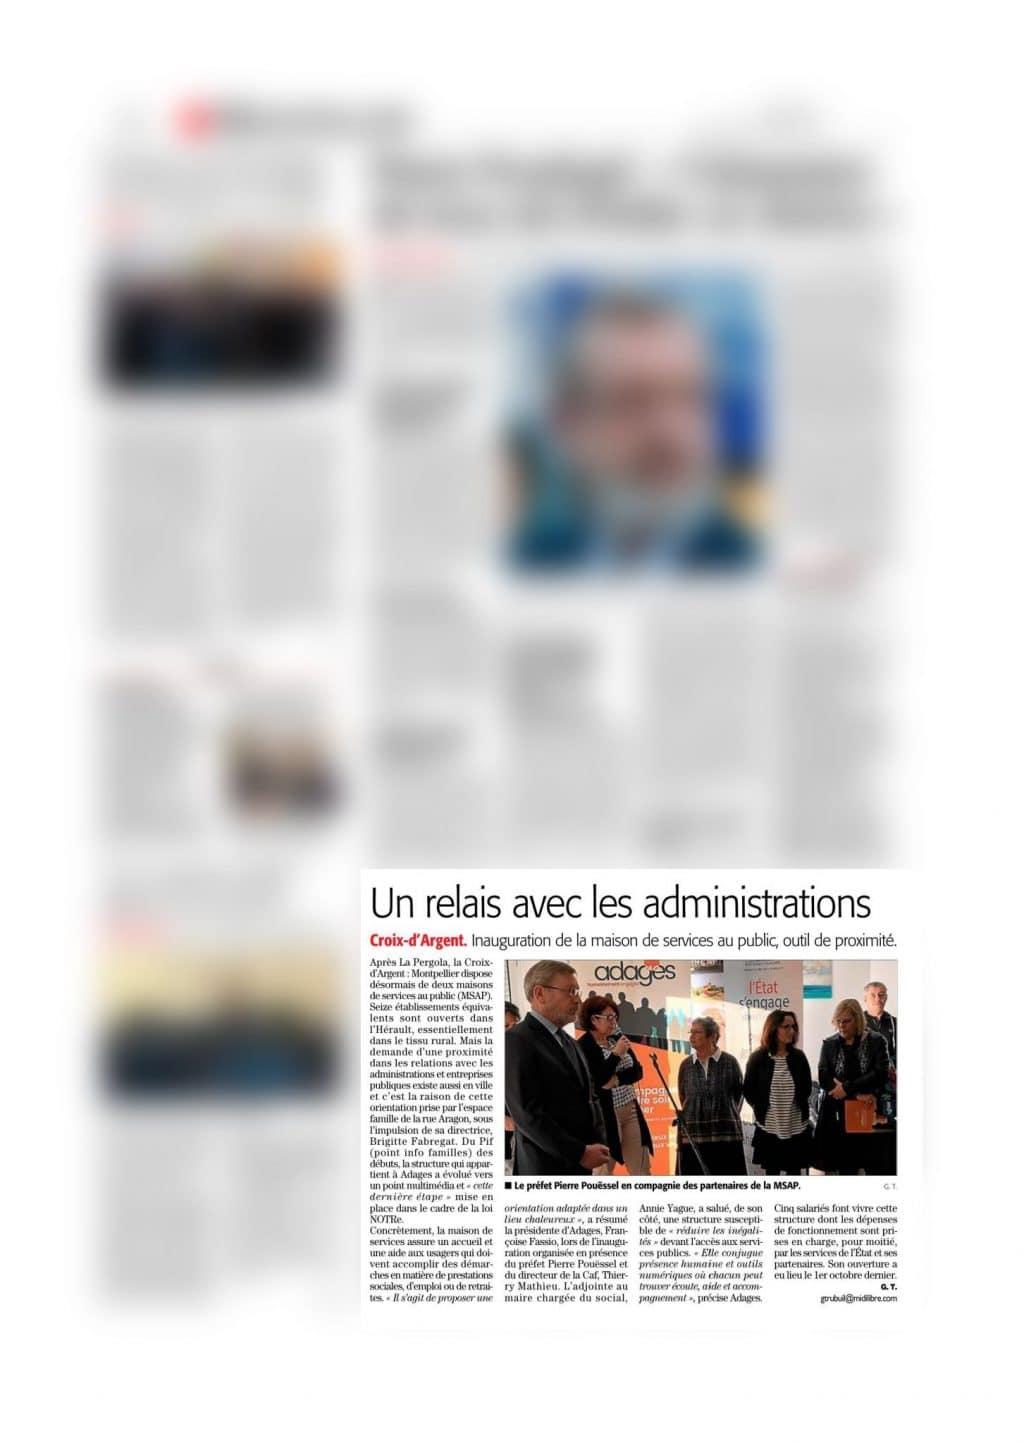 Midi Libre | Un relais avec les administrations 1